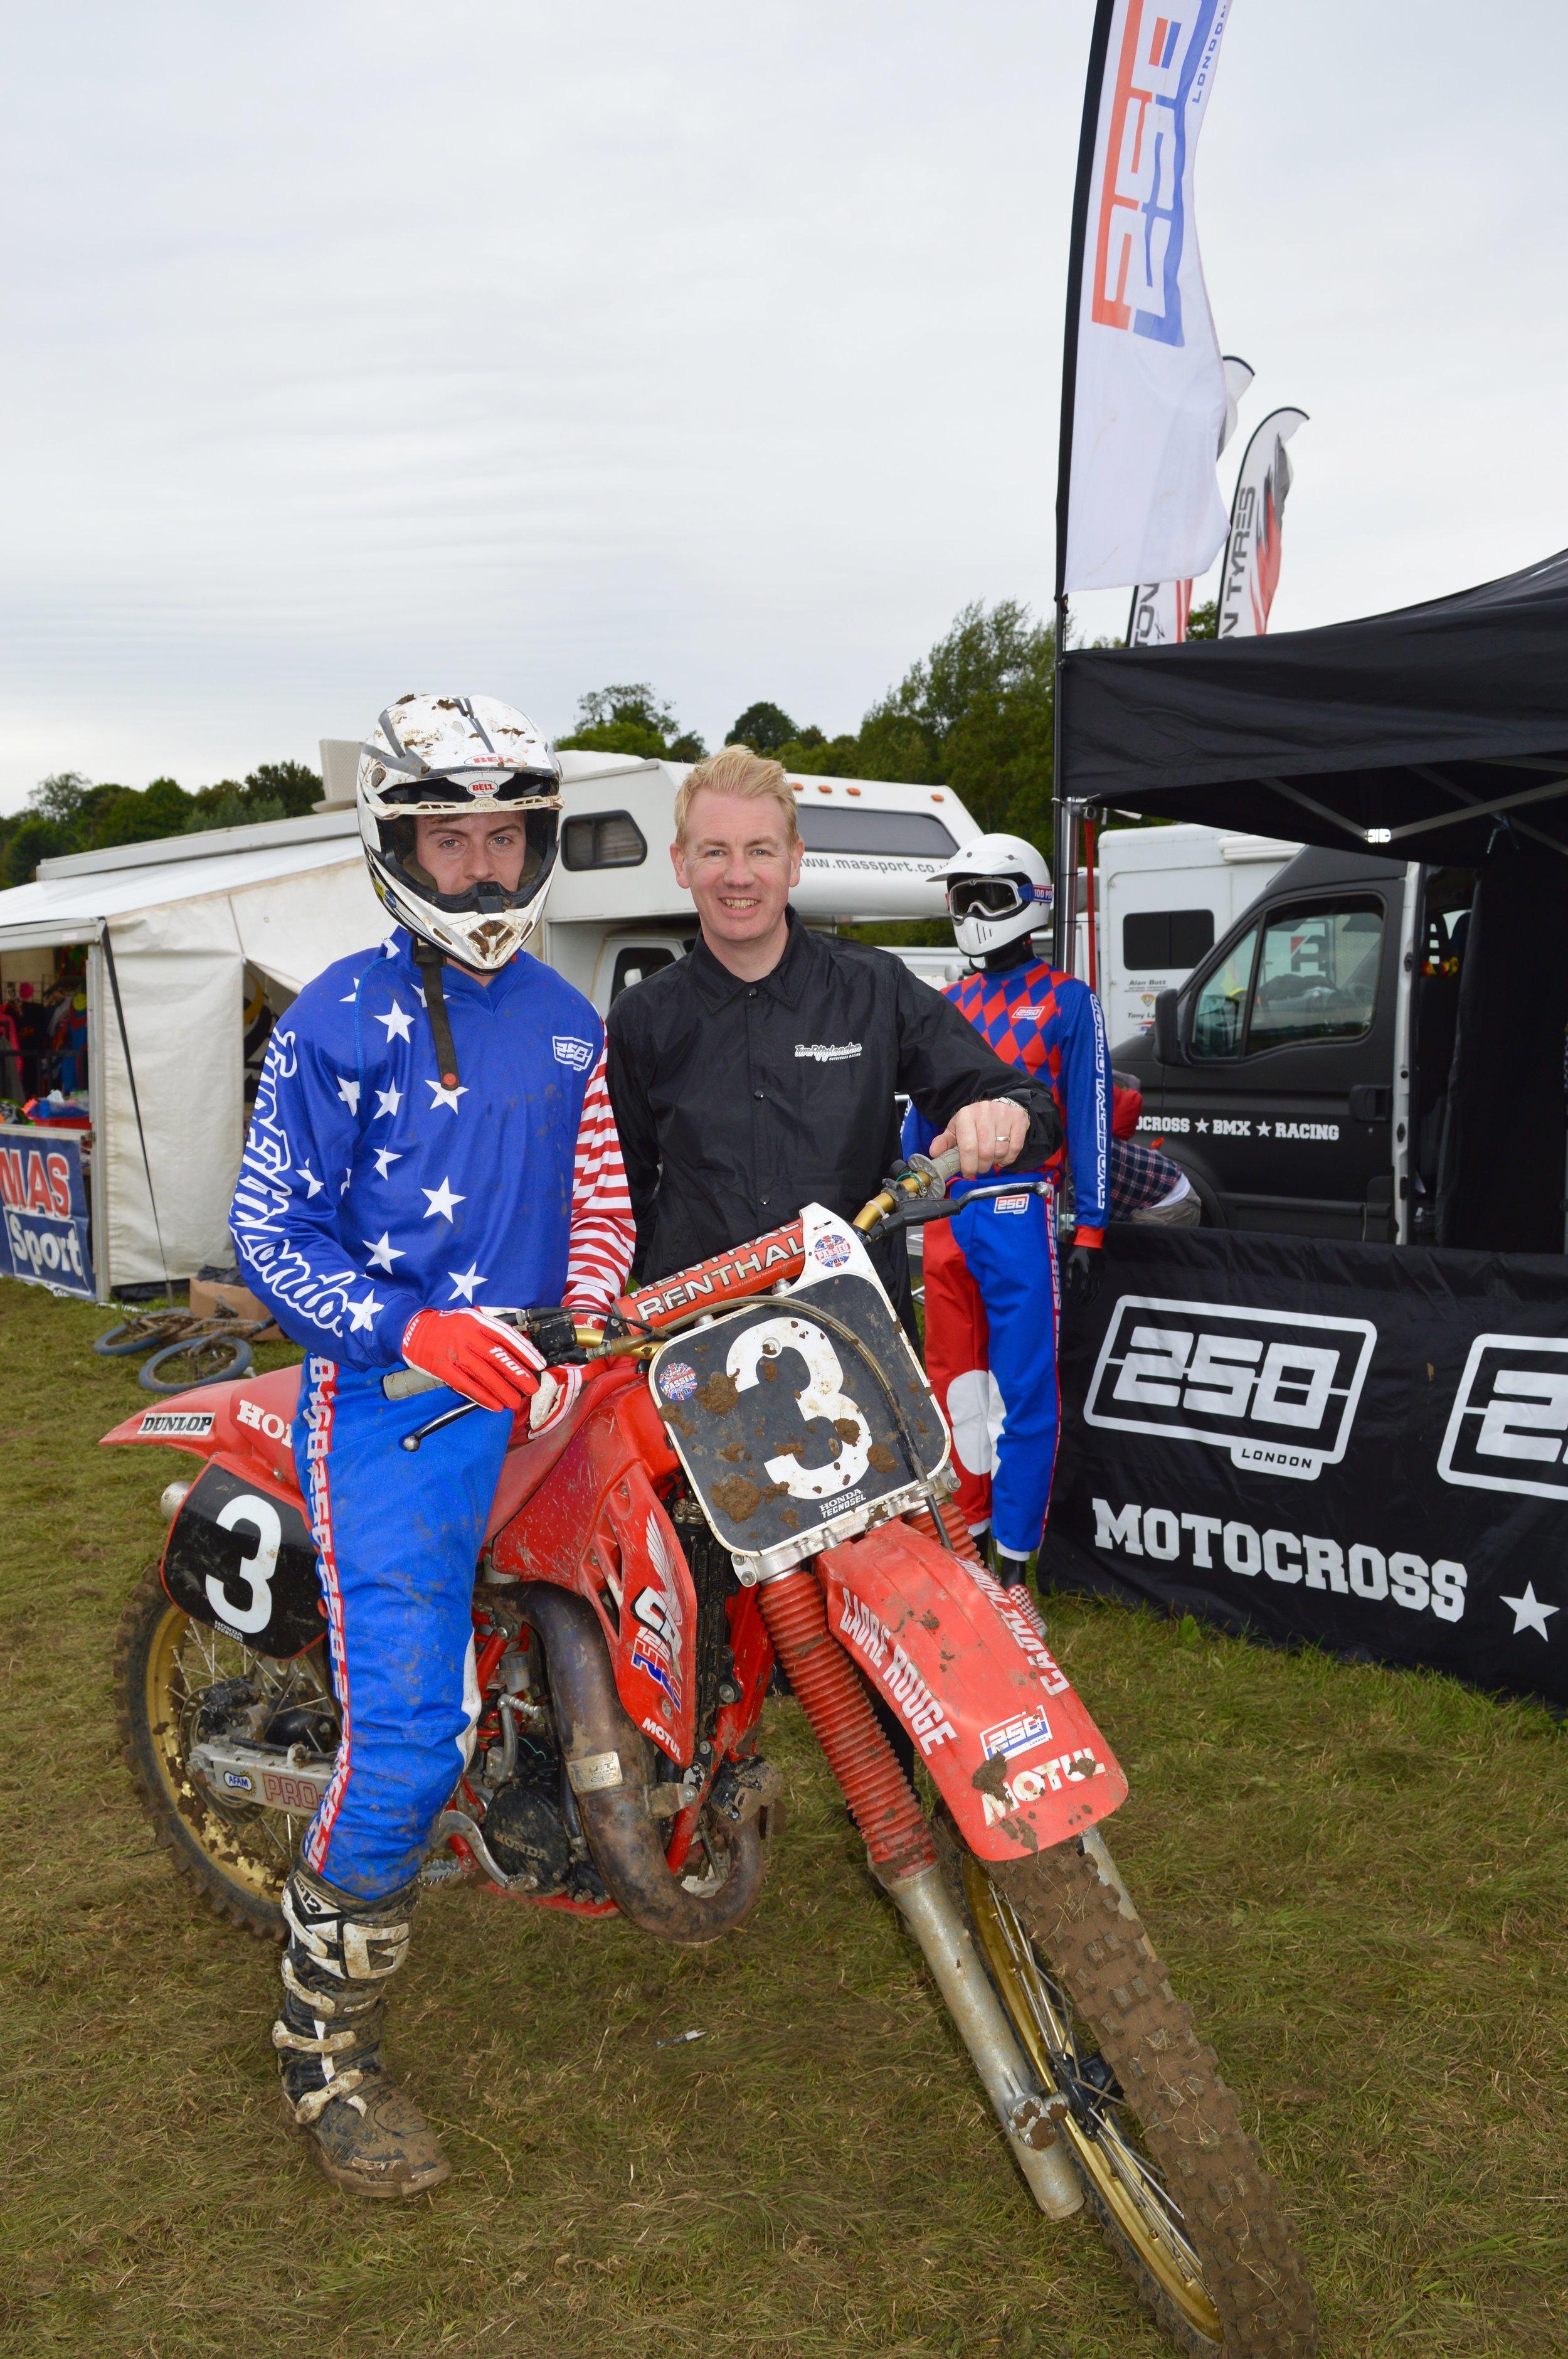 Bradley with Mr 250